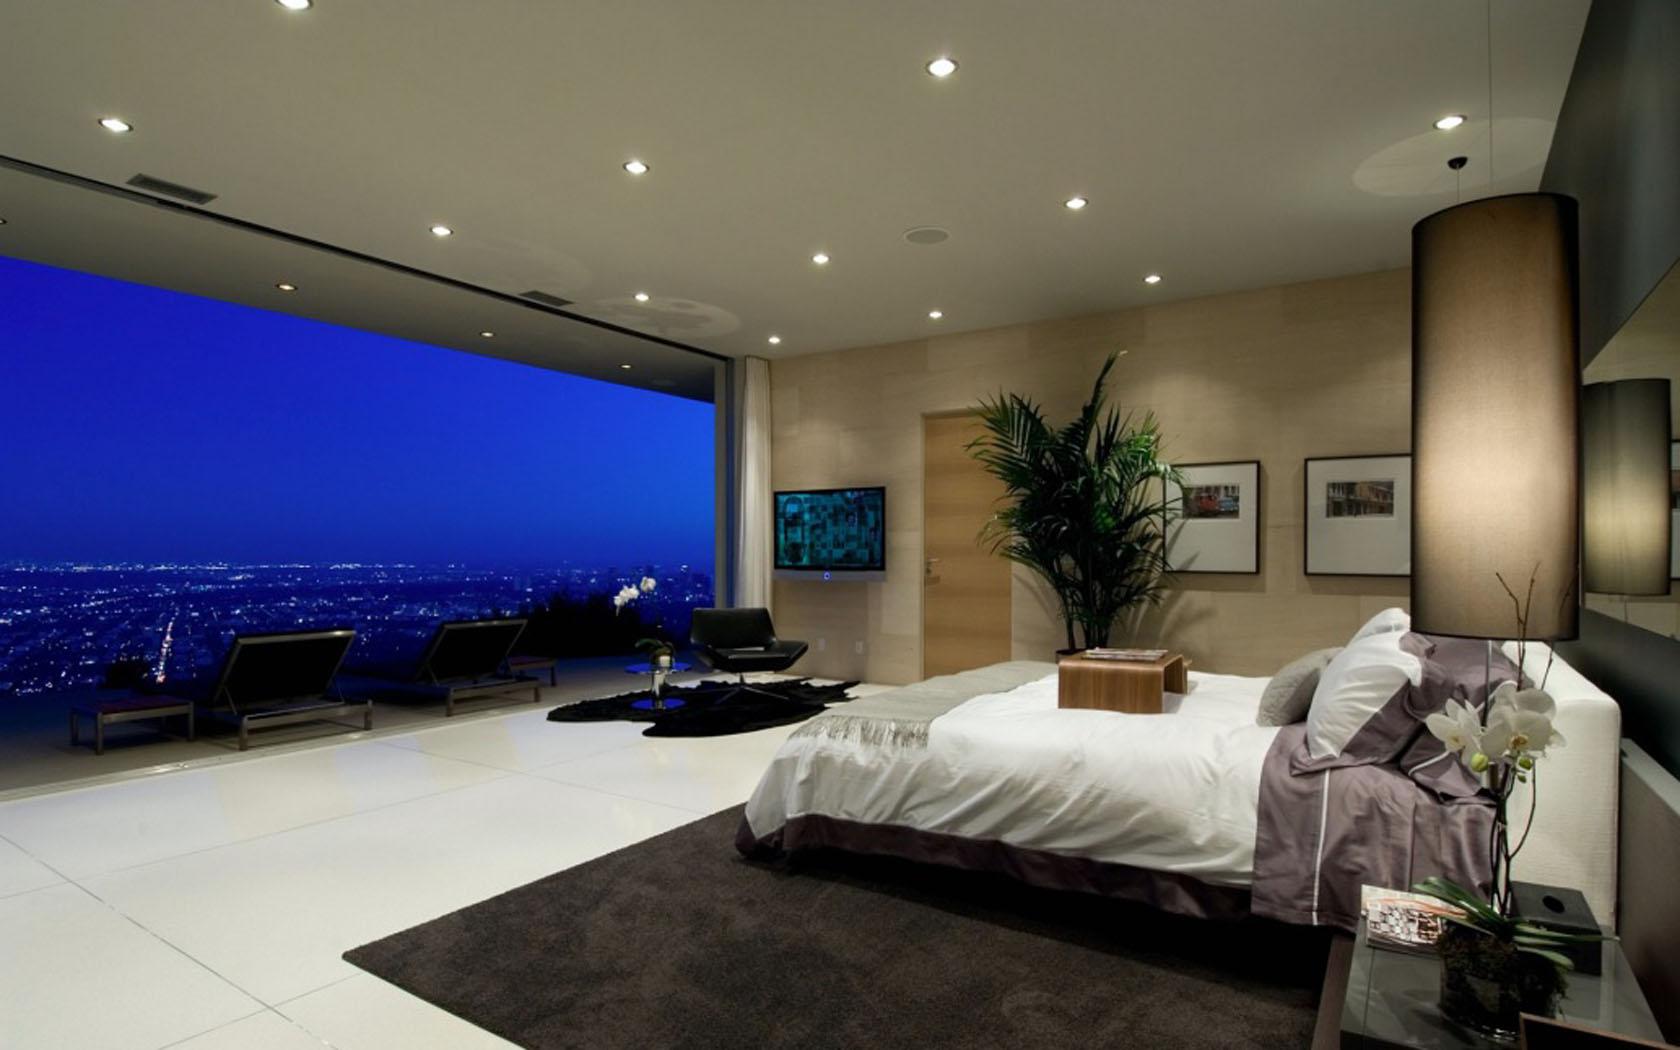 Bedroom Bed Architecture Interior Design Wallpaper | 1680x1050 | 148313 |  WallpaperUP